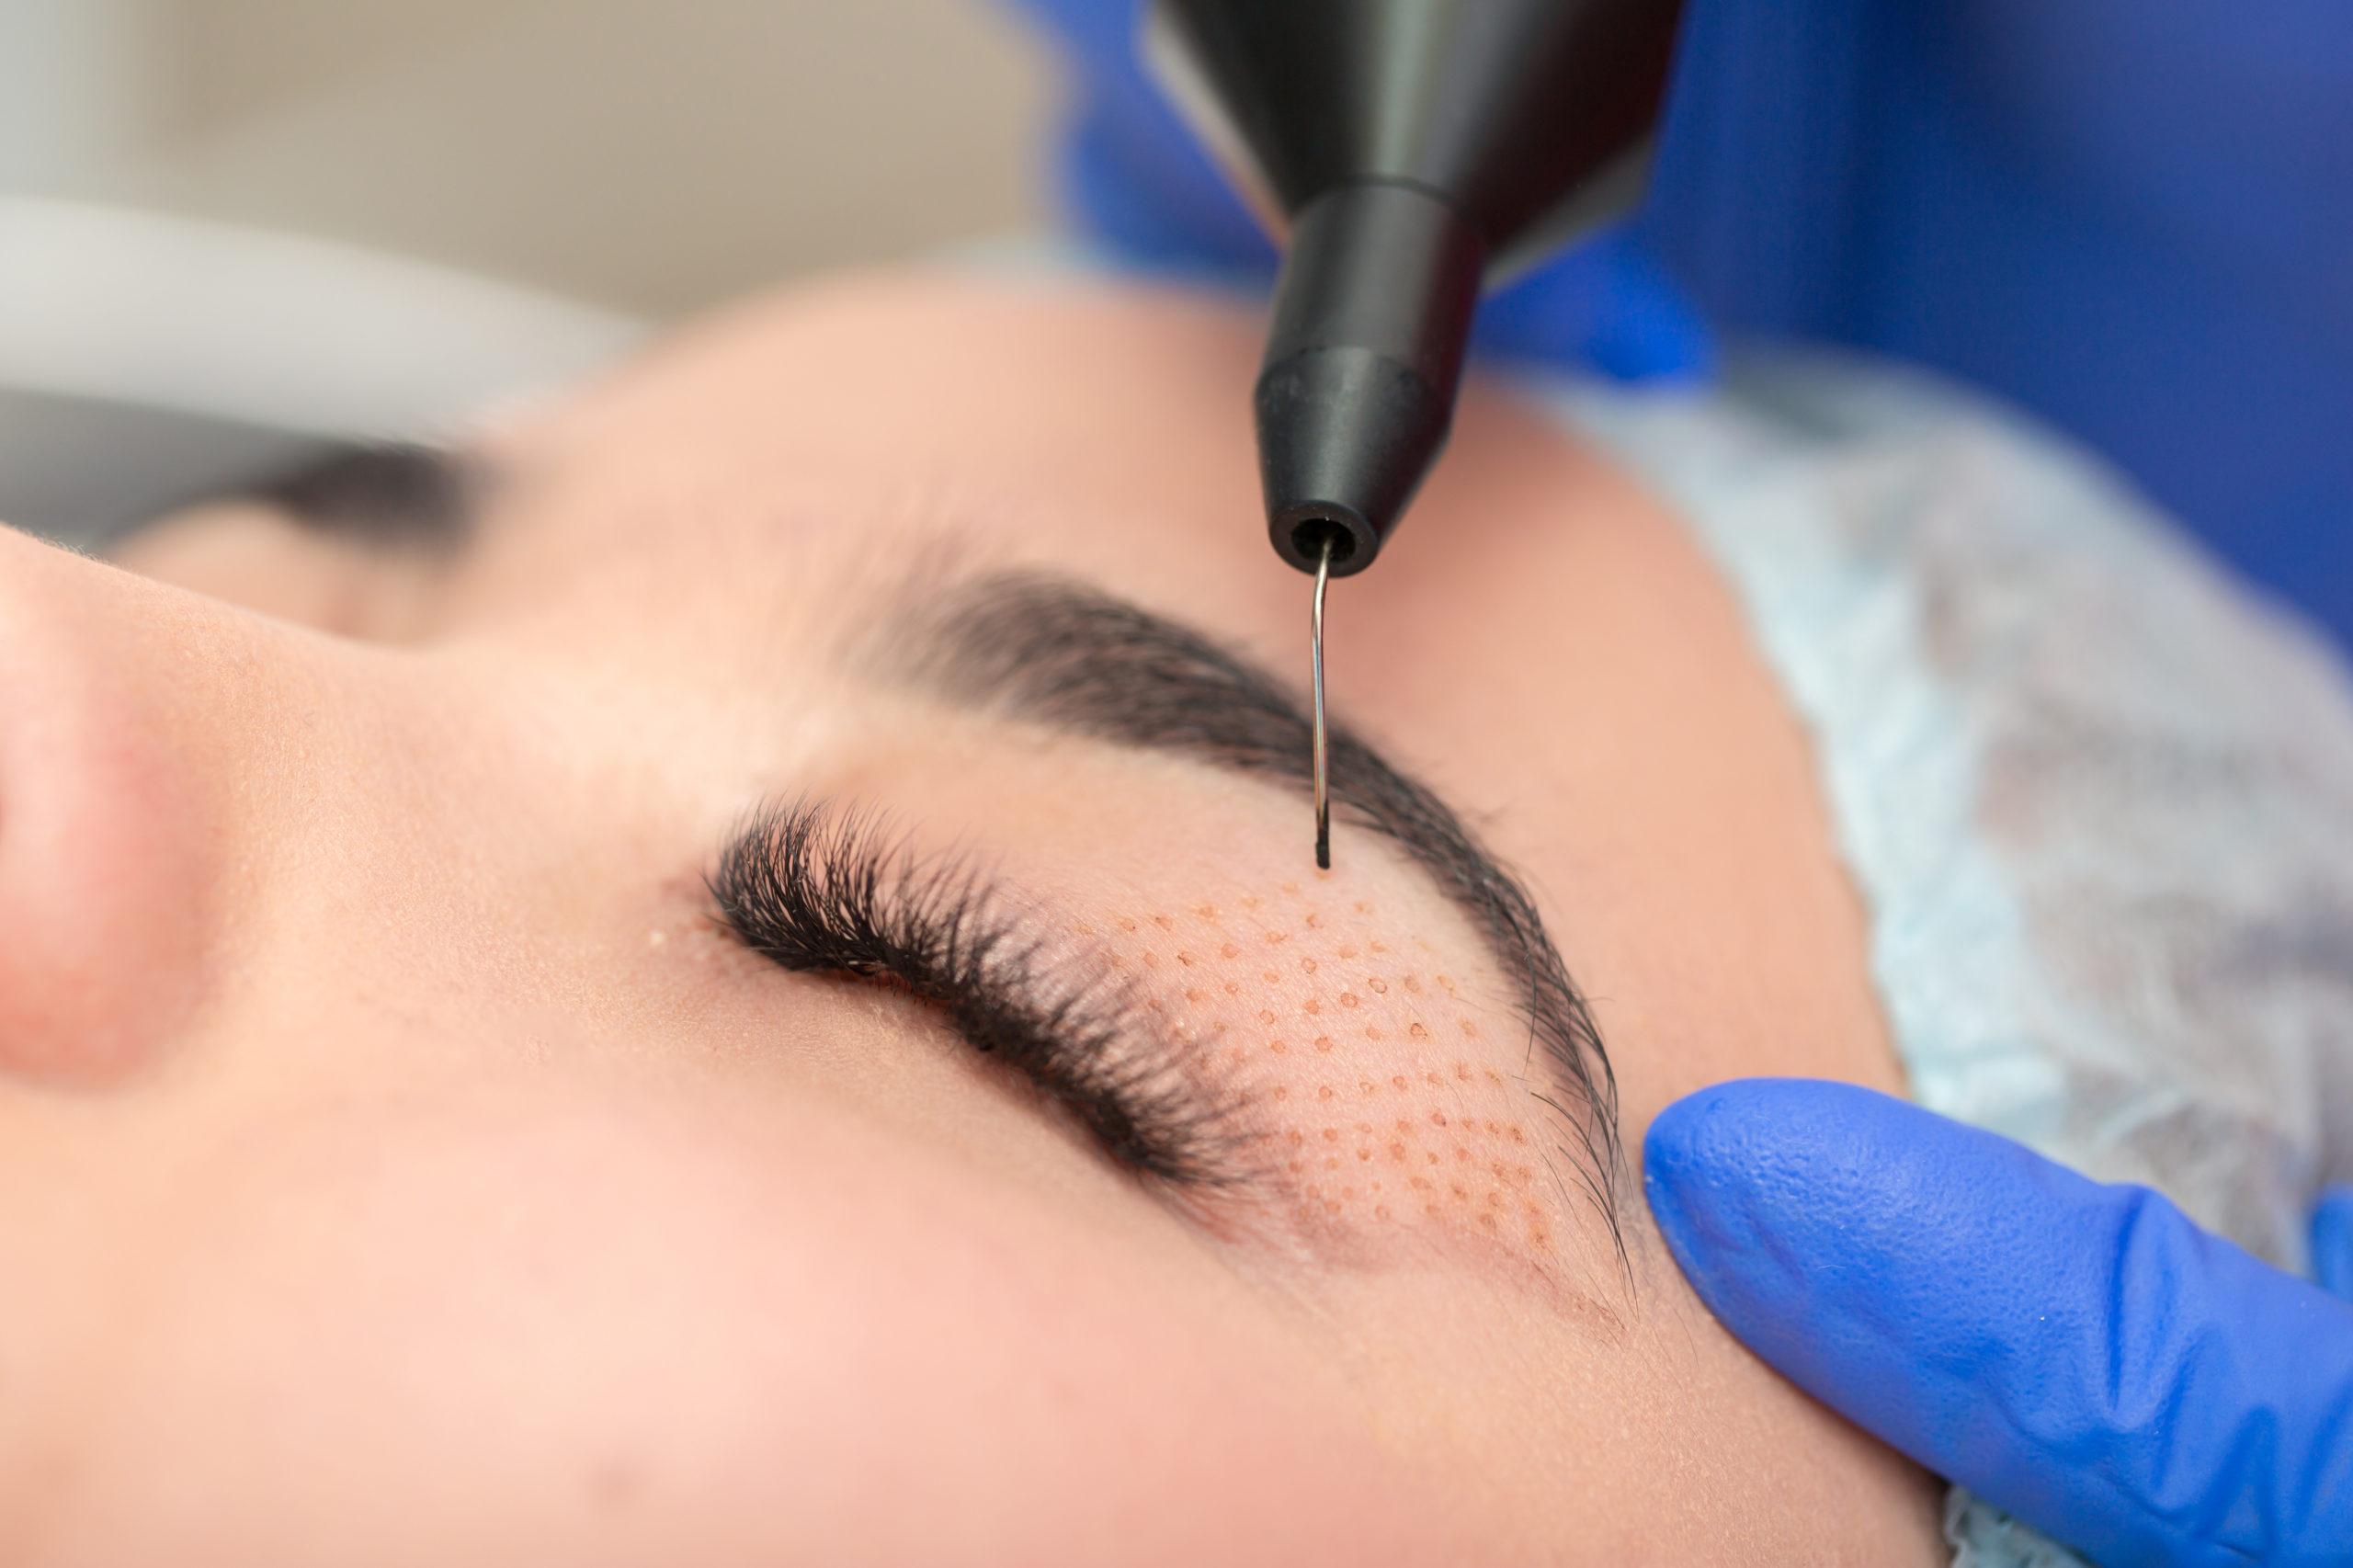 Droopy eyelids? The no-knife eye lift